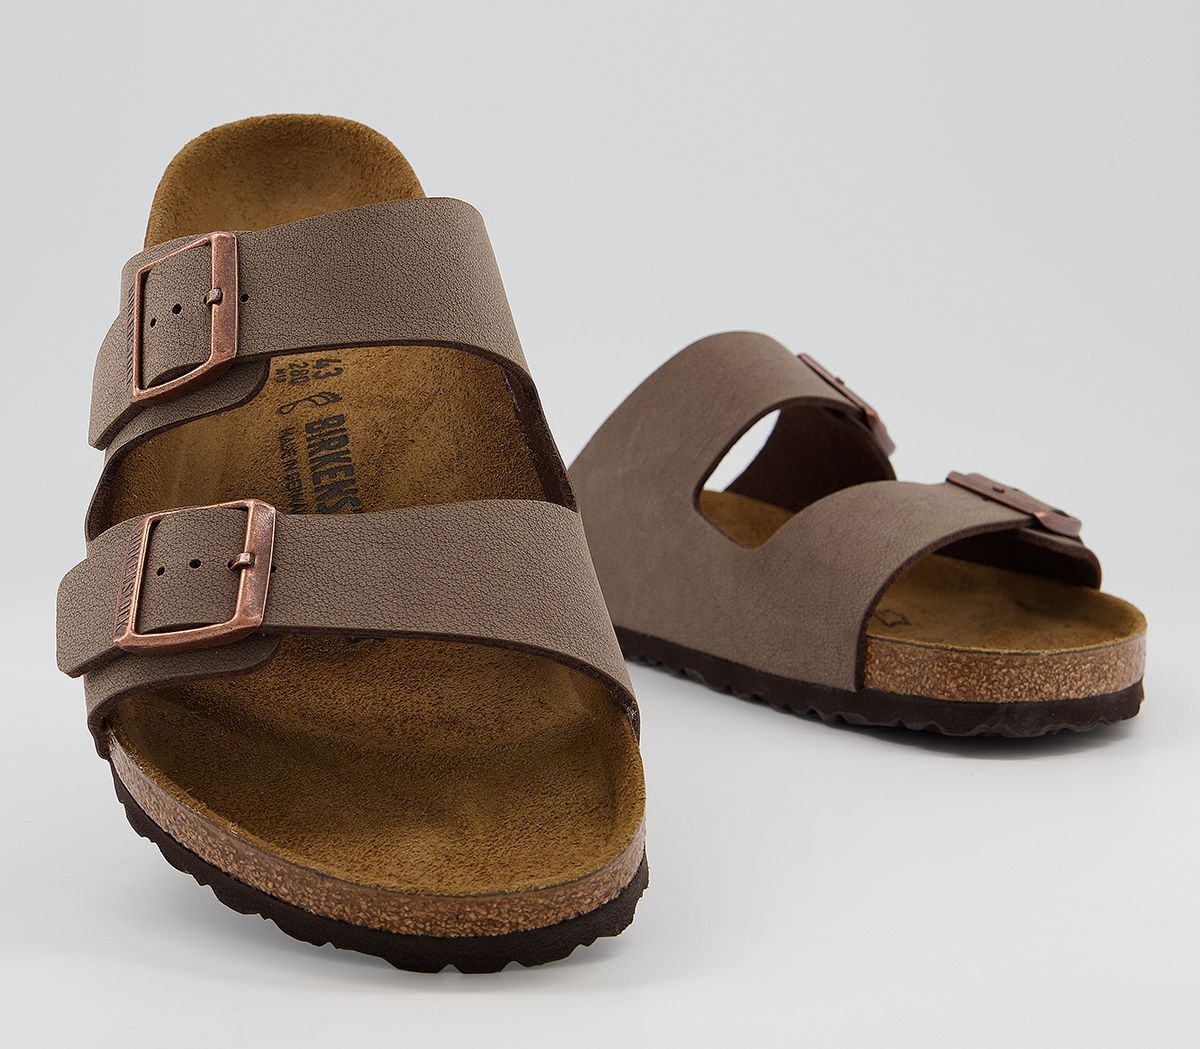 Details about Mens Birkenstock Arizona Two Strap Sandals Mocca Sandals